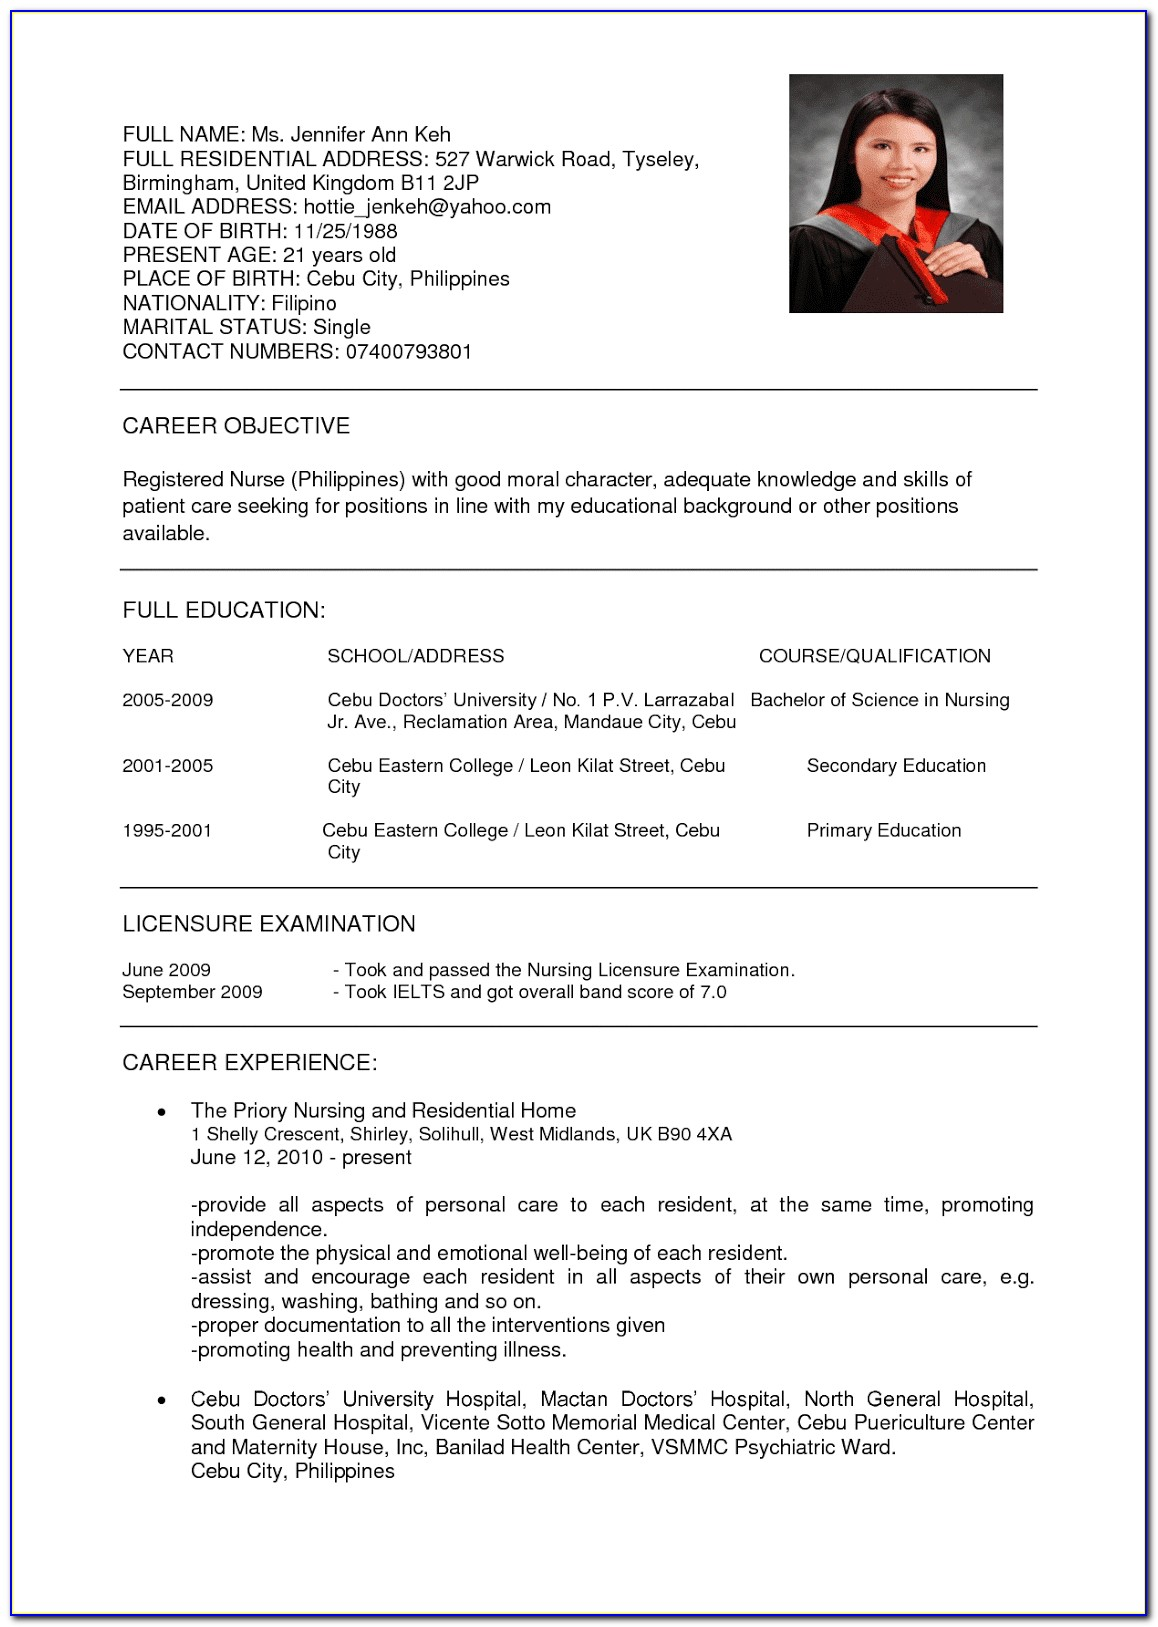 Resume Format For Nurses In Canada